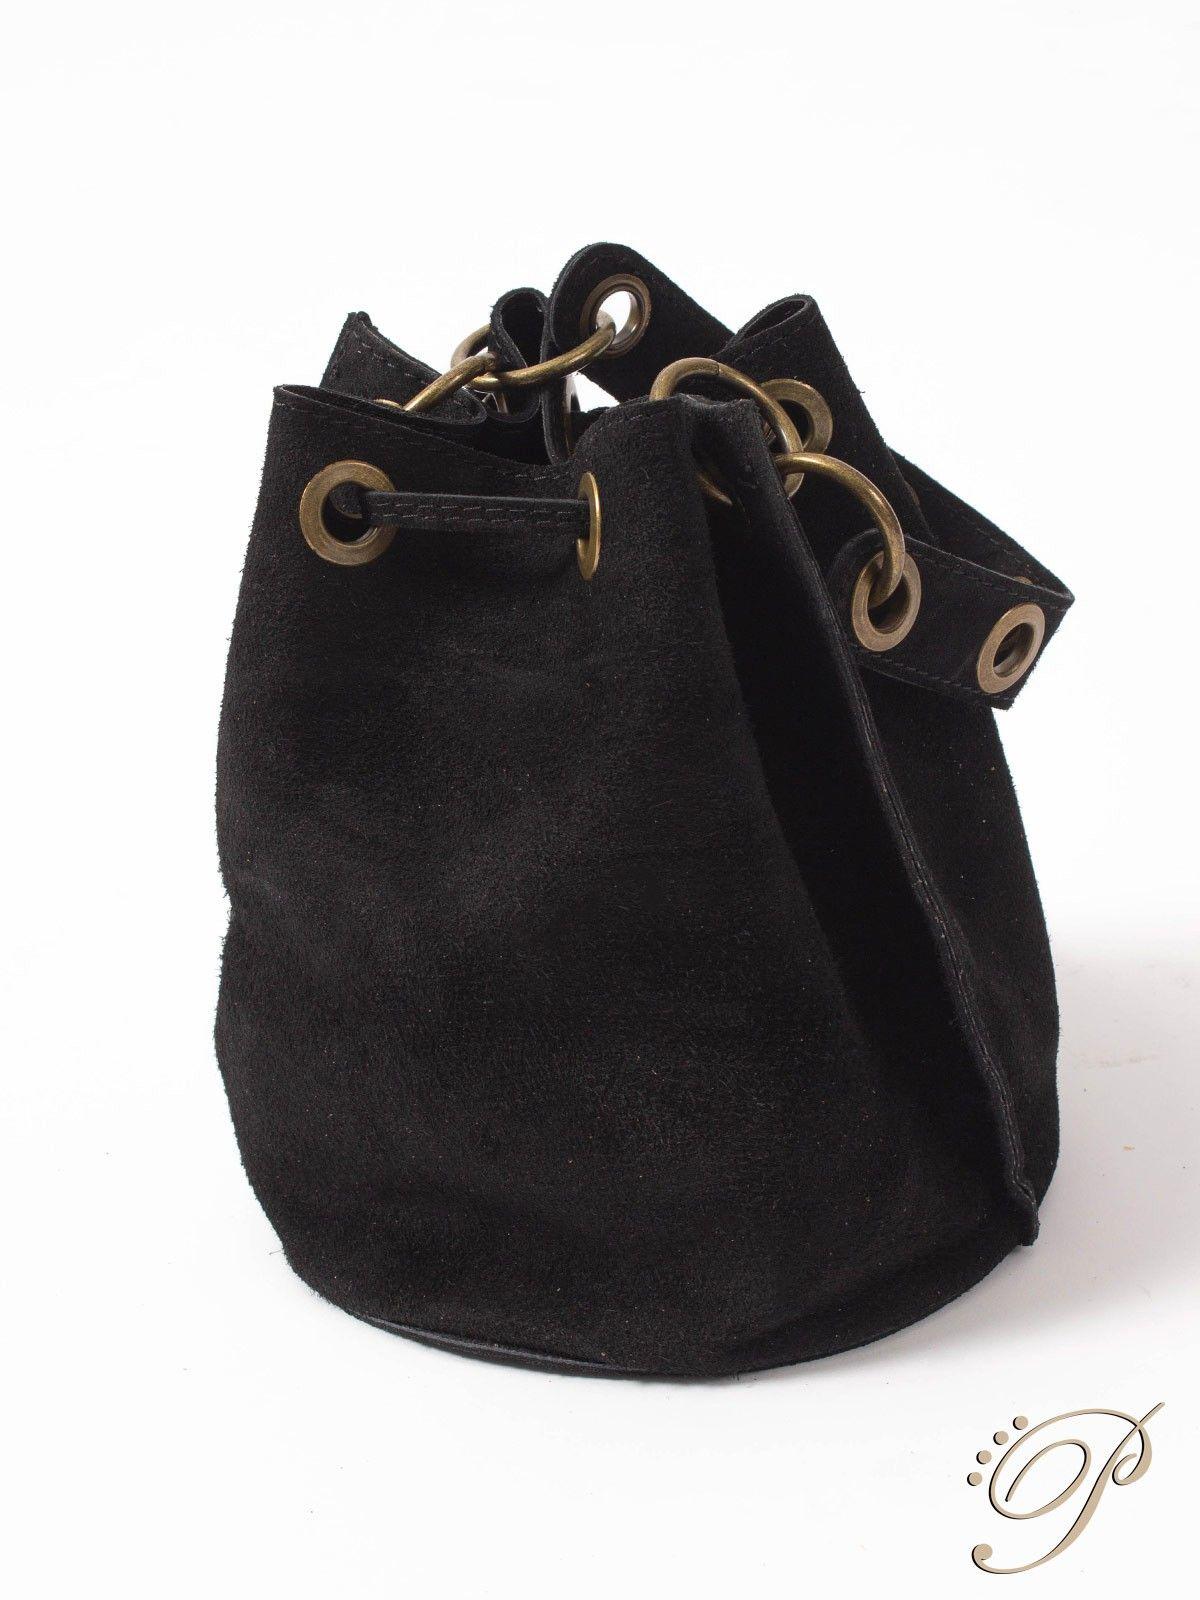 4c7d0ab8d0d99 Bolso Senia Negro - Bolso tipo saco de serraje en color negro. Asa corta.